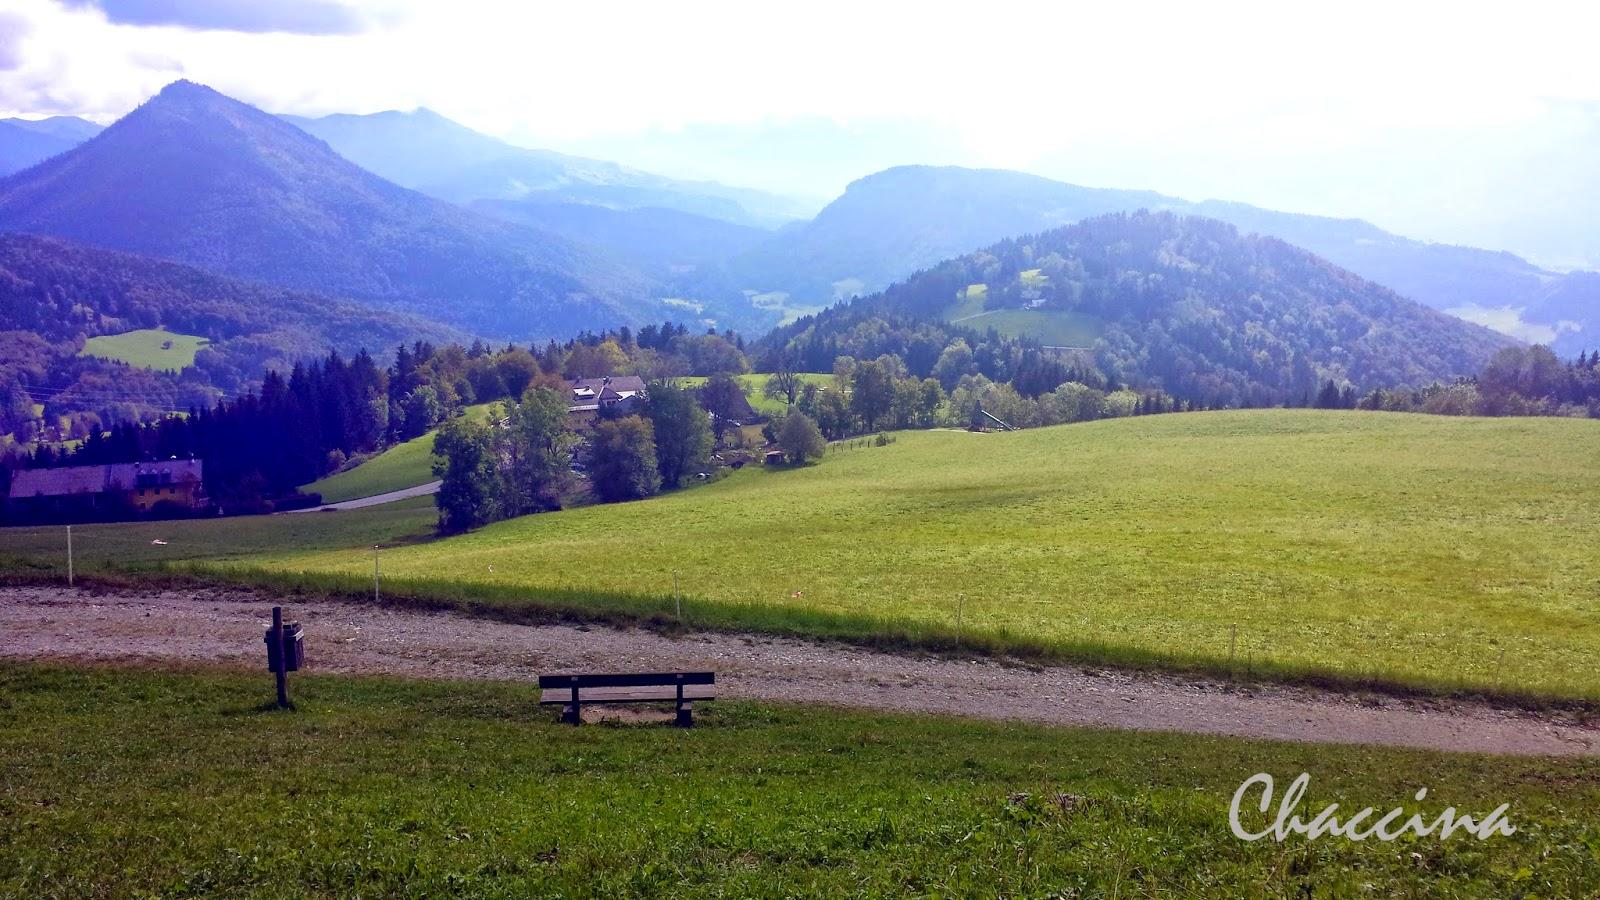 Chaccina Lifestyleblog / Salzburg / Gaisberg